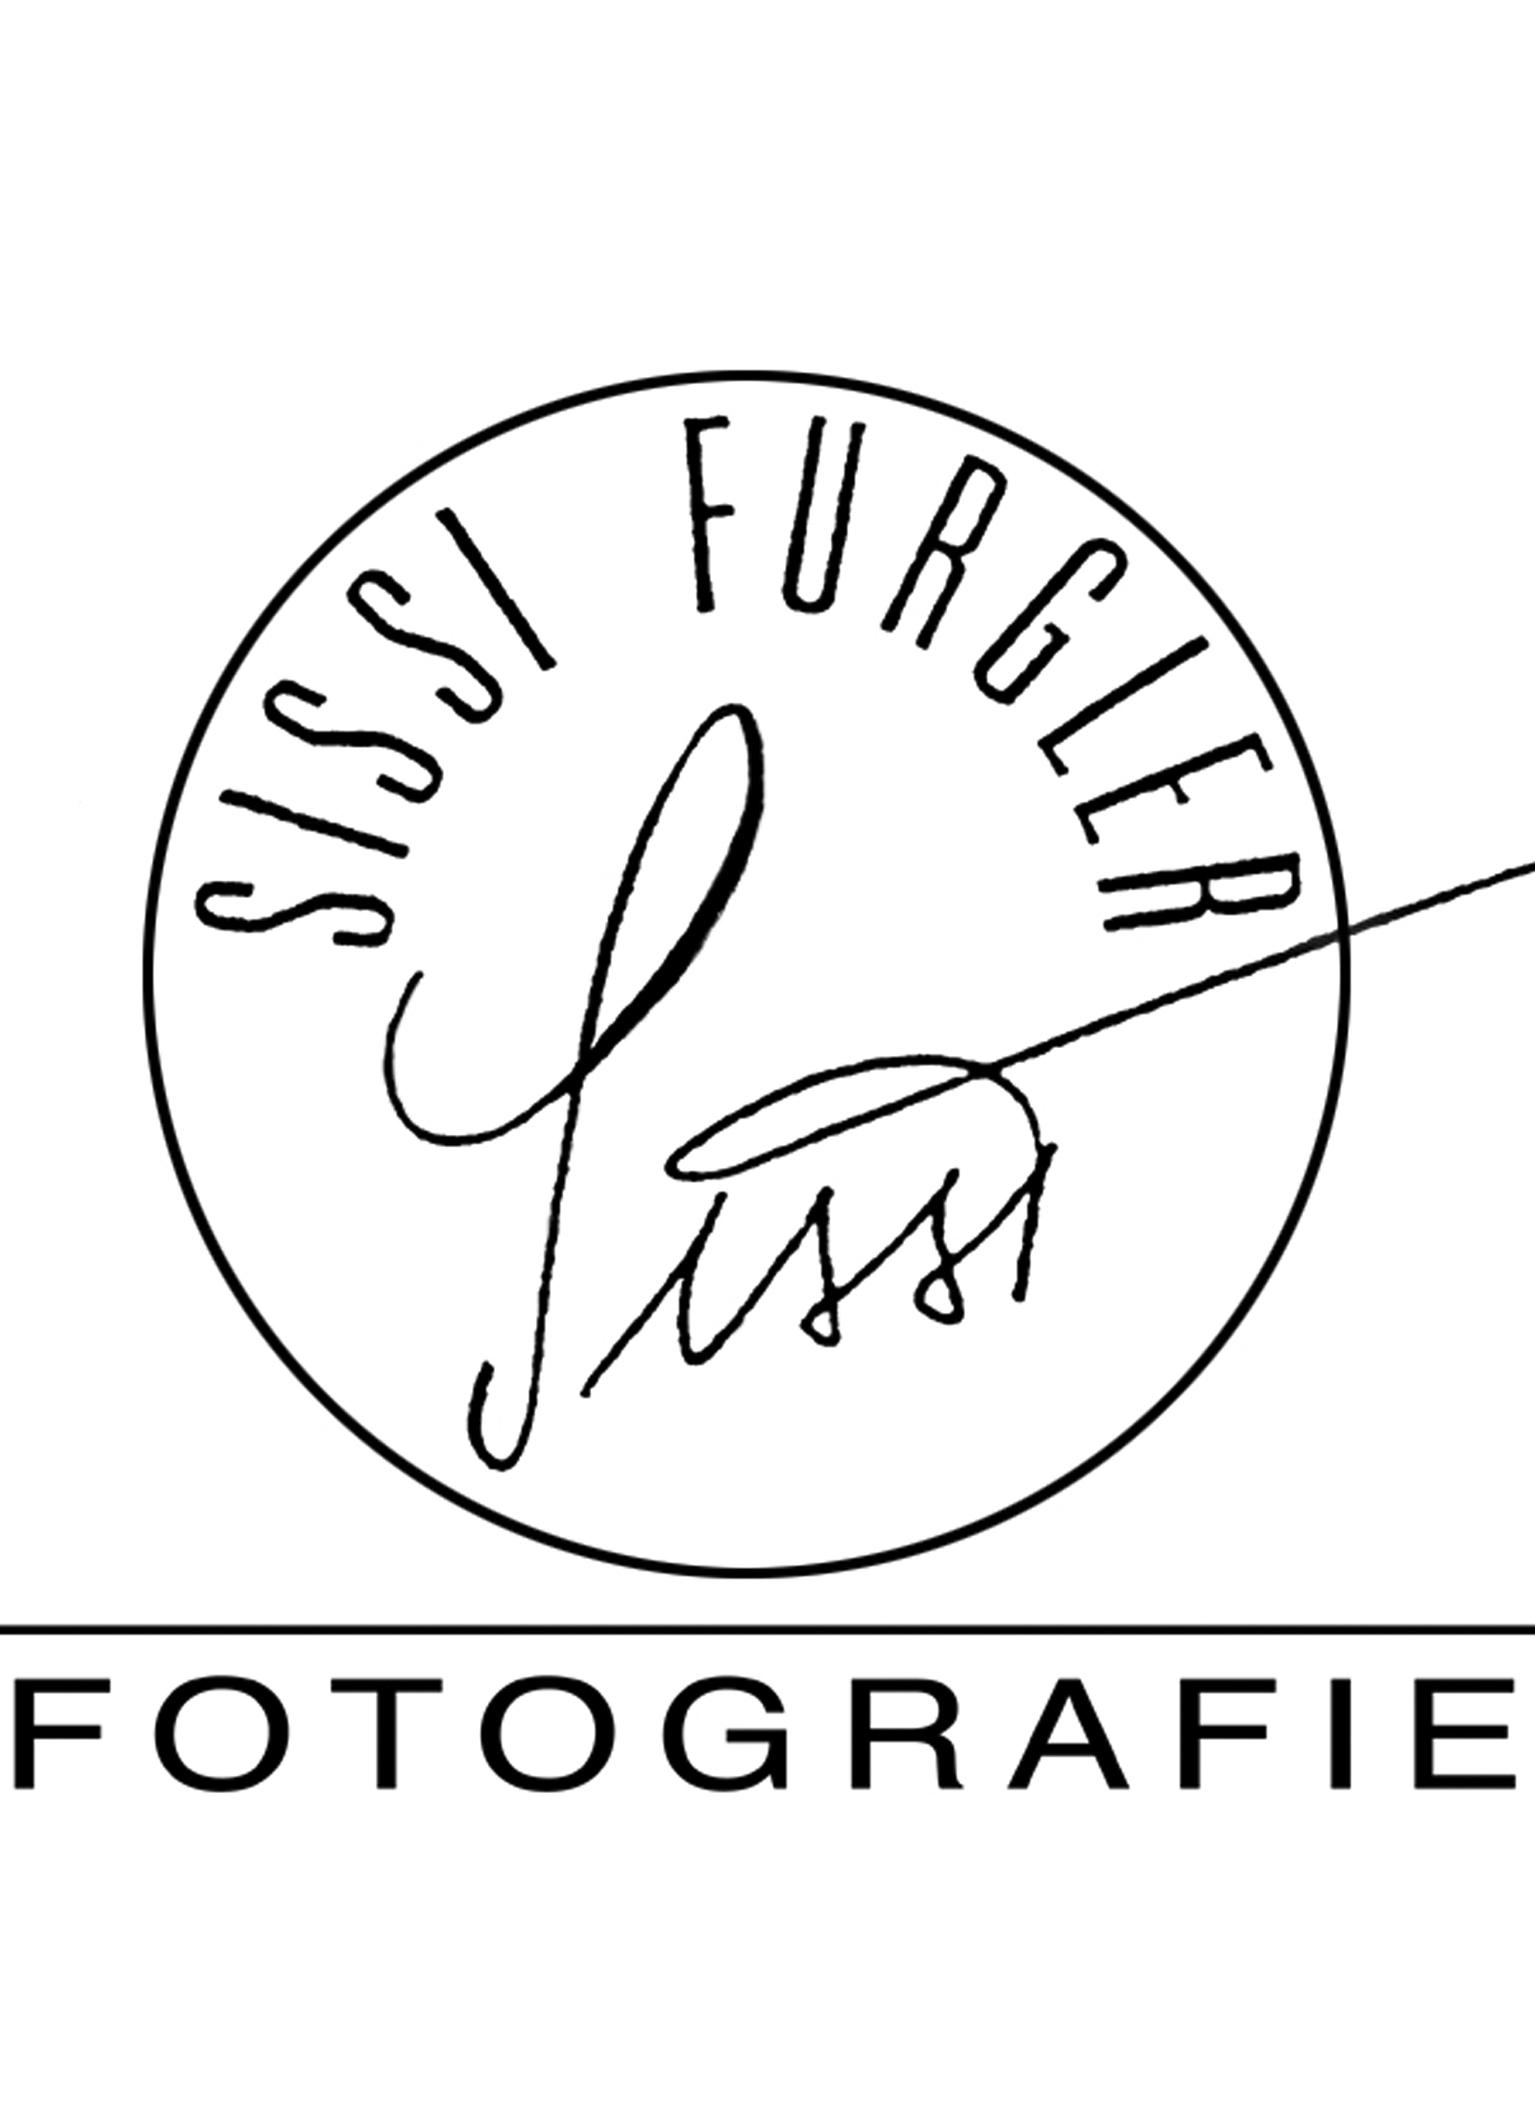 Frauenportrait Logo